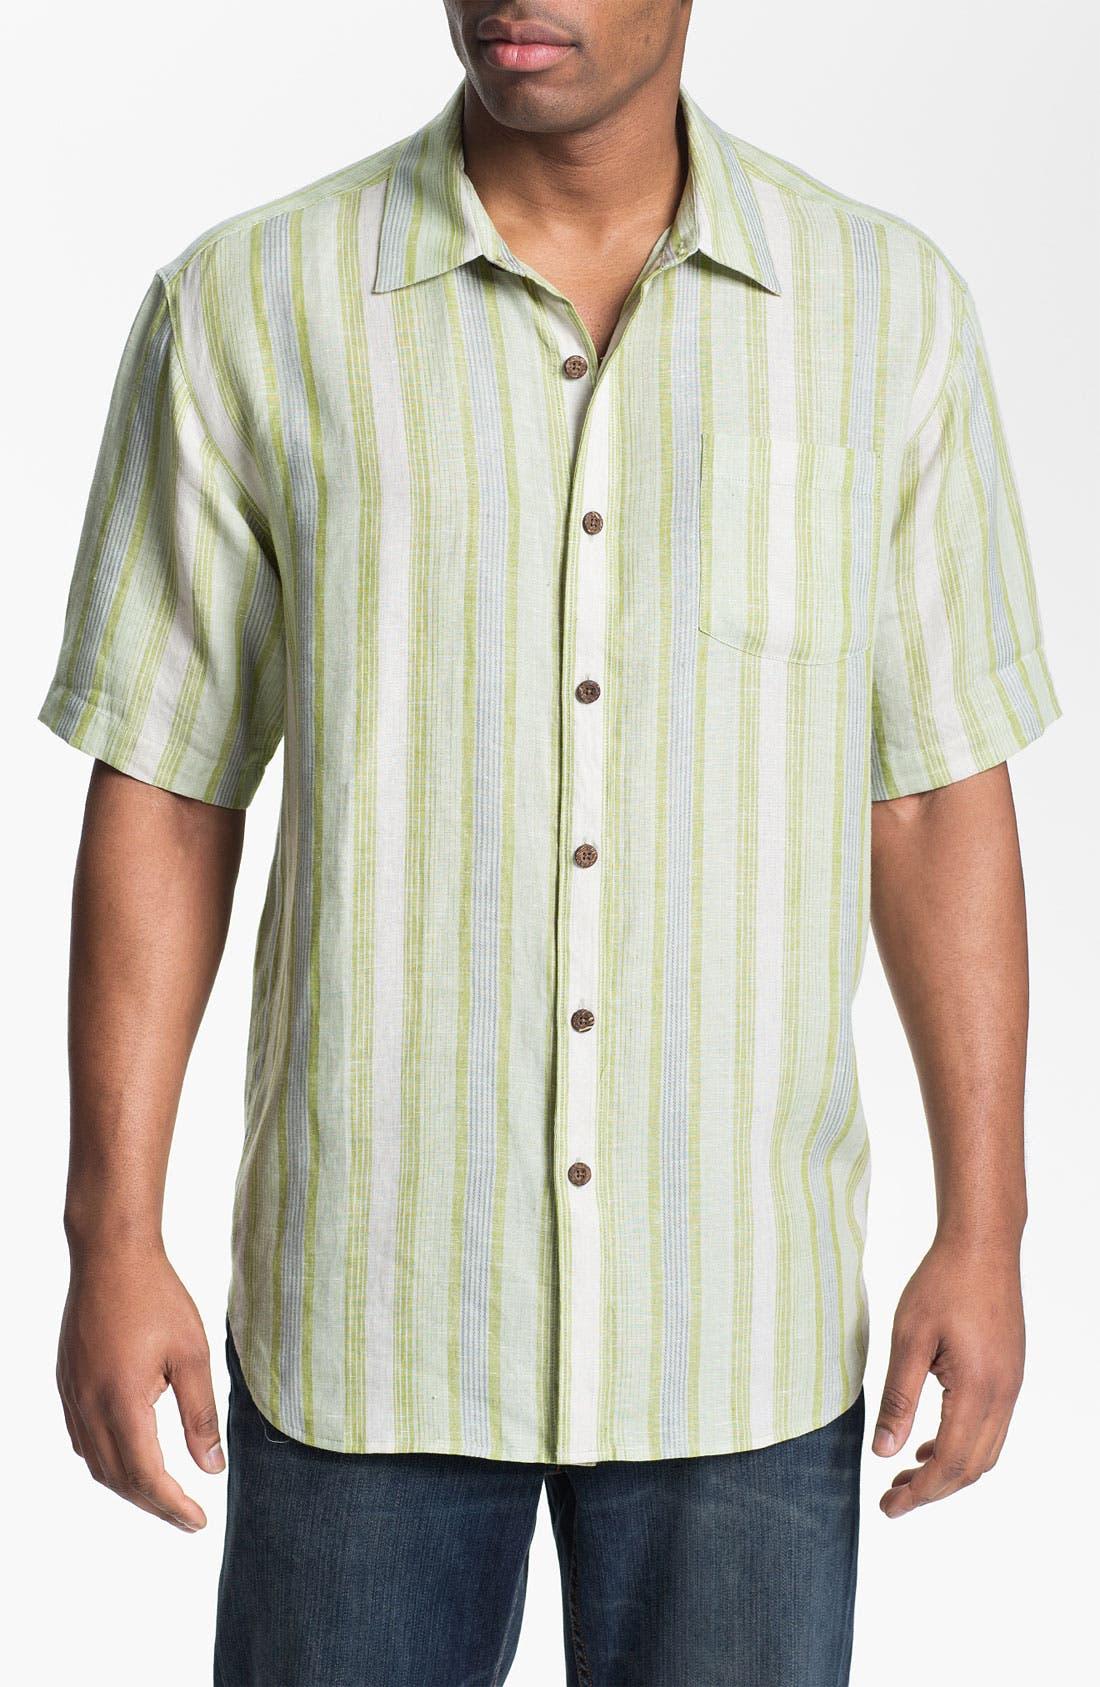 Alternate Image 1 Selected - Tommy Bahama 'Aquarina' Linen Sport Shirt